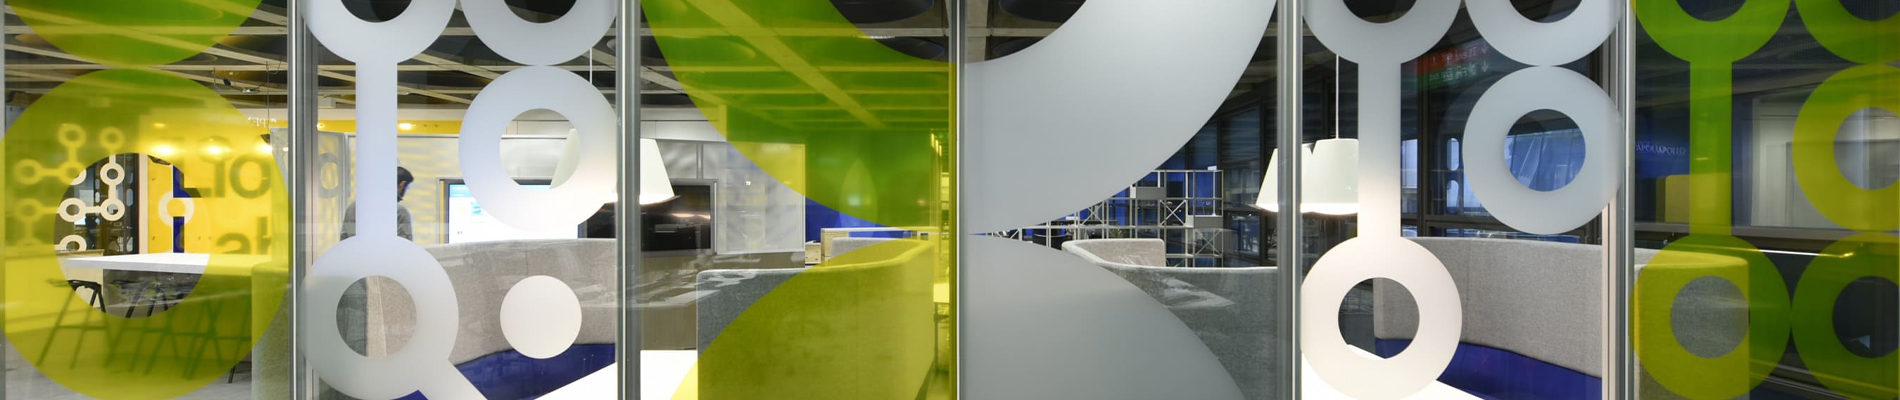 Product Innovation Facility